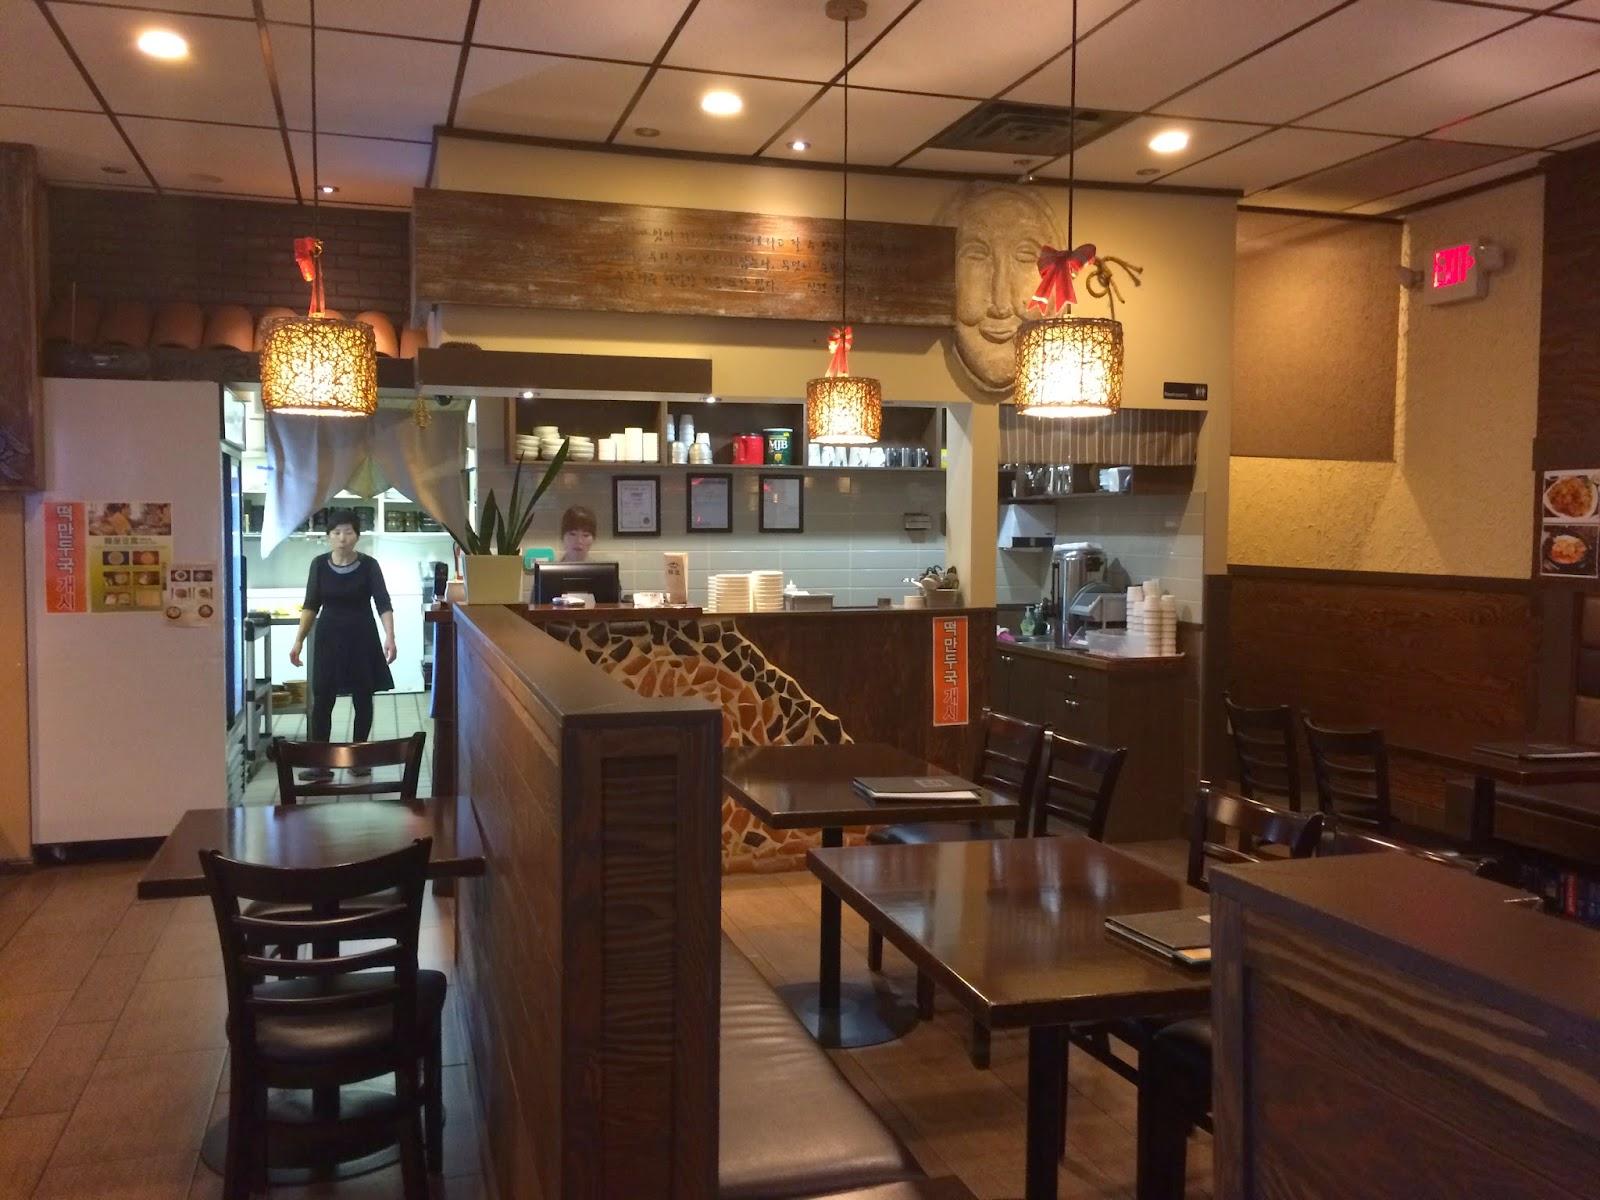 Hanok Korean Restaurant 韓屋 : Burnaby Location |MISSVANCOUVERPIGGY